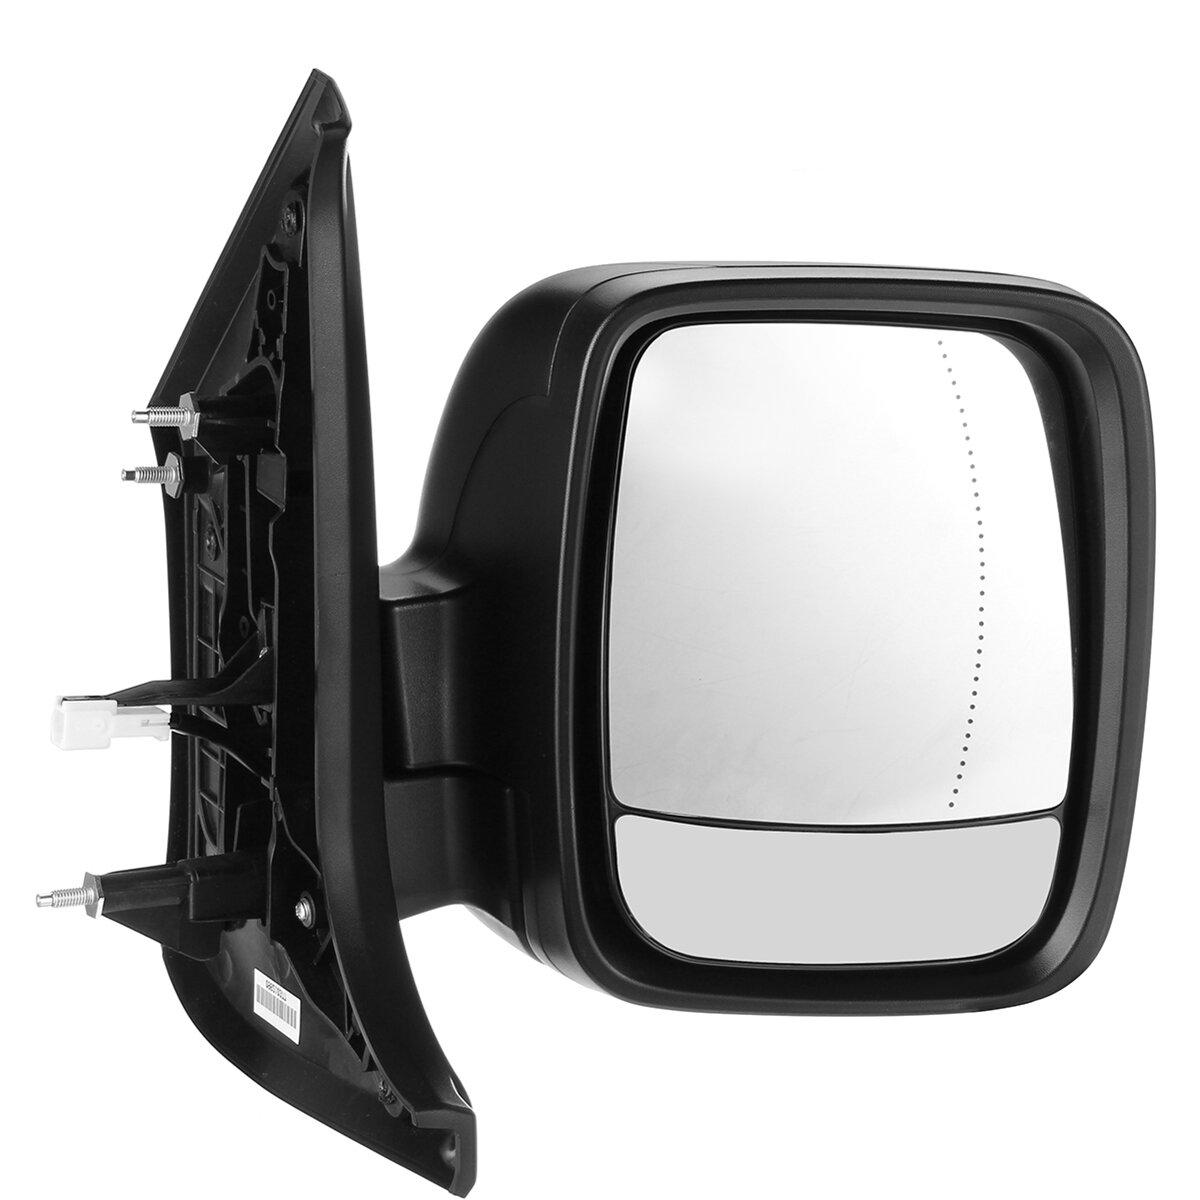 Car Right Electric Black Wing Mirror For Vauxhall Vivaro Renault Trafic Van 2015-18